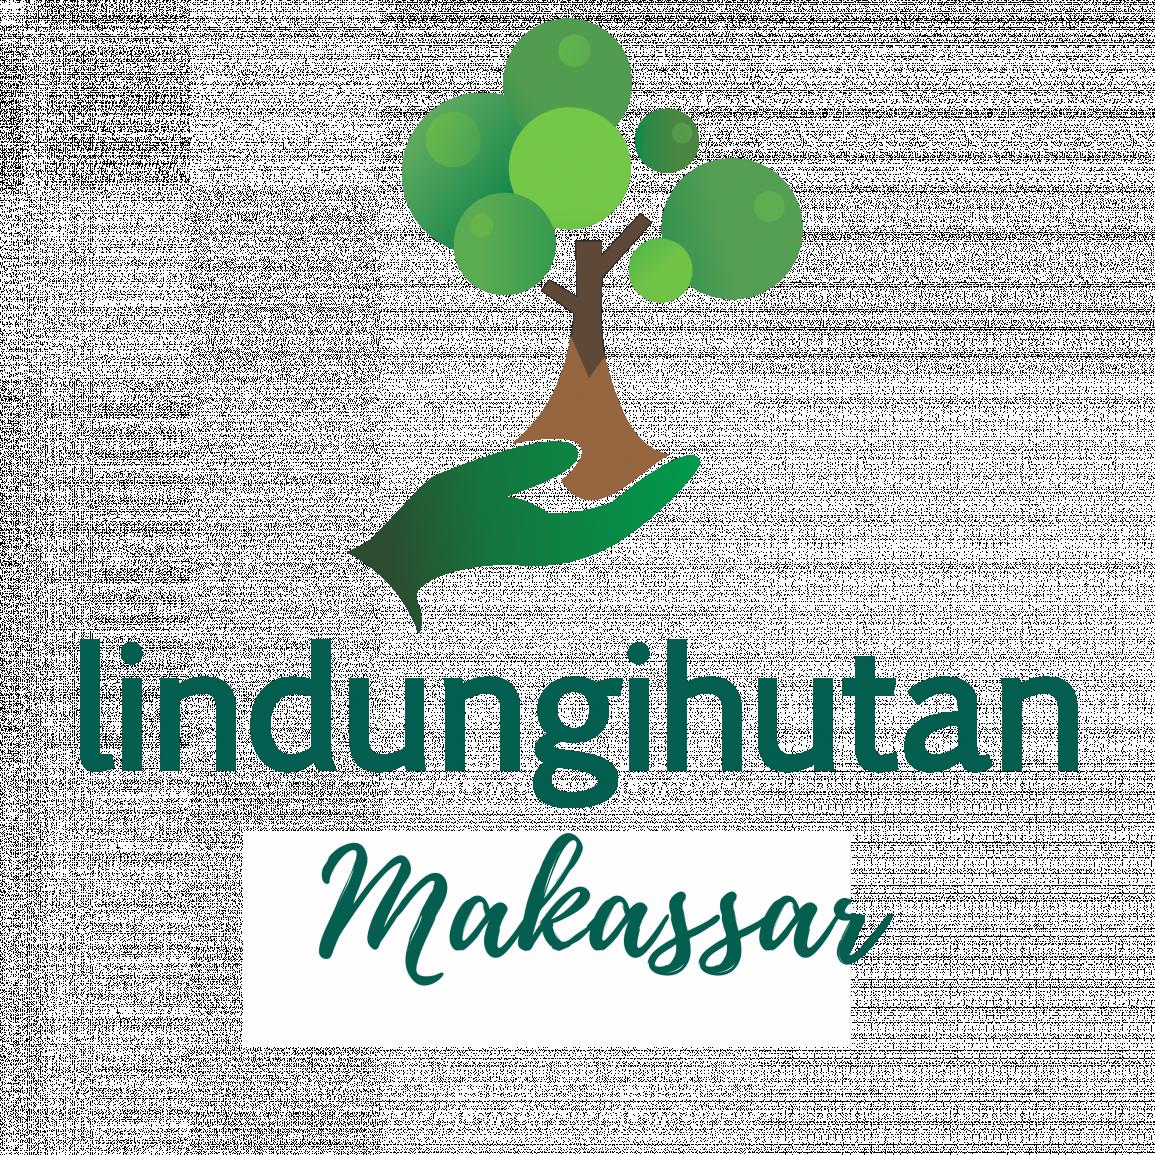 Relawan Makassar